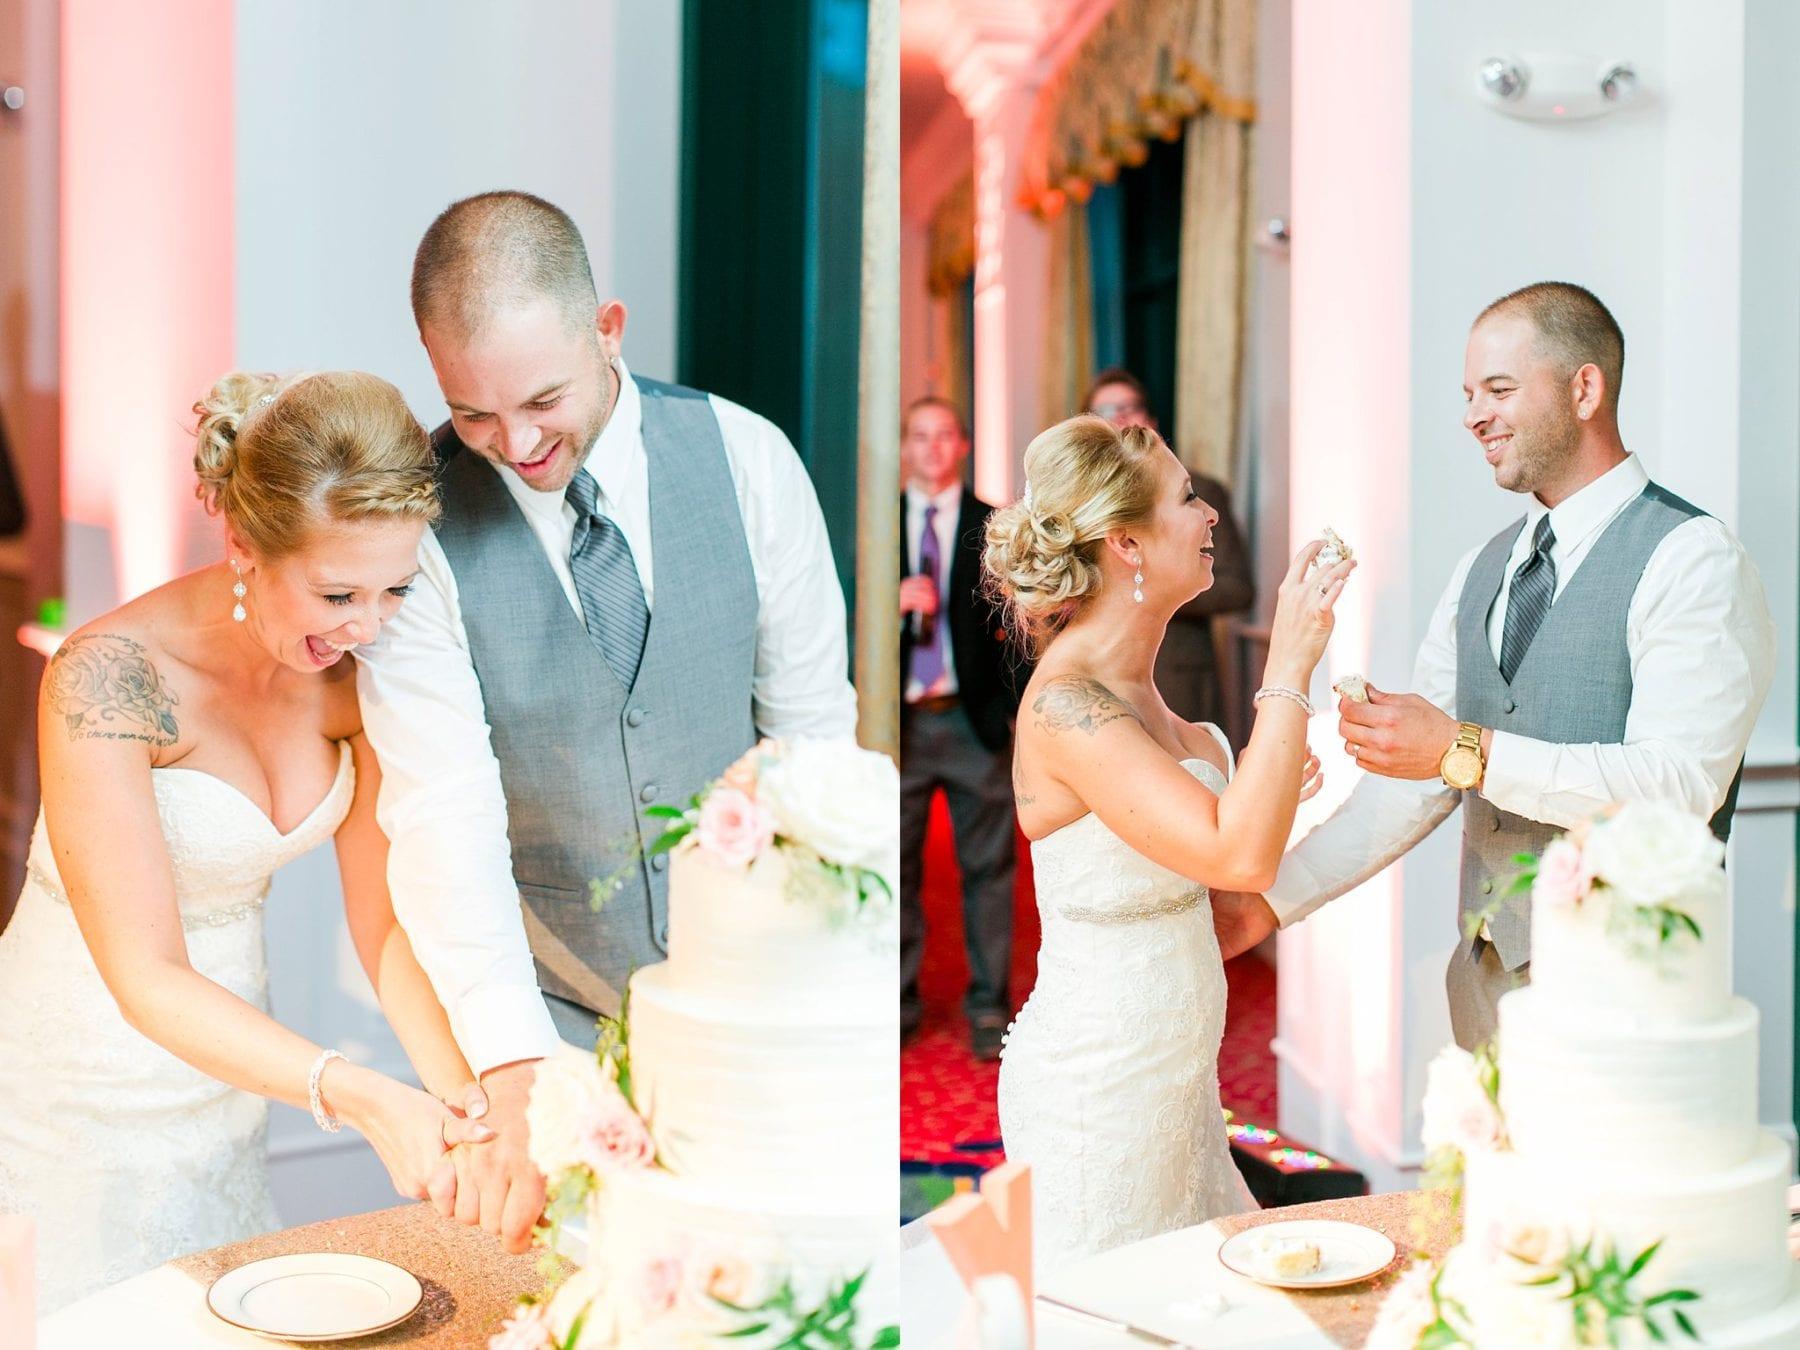 Waters Edge Wedding Photos Maryland Wedding Photographer Megan Kelsey Photography Katie & Conor-666.JPG